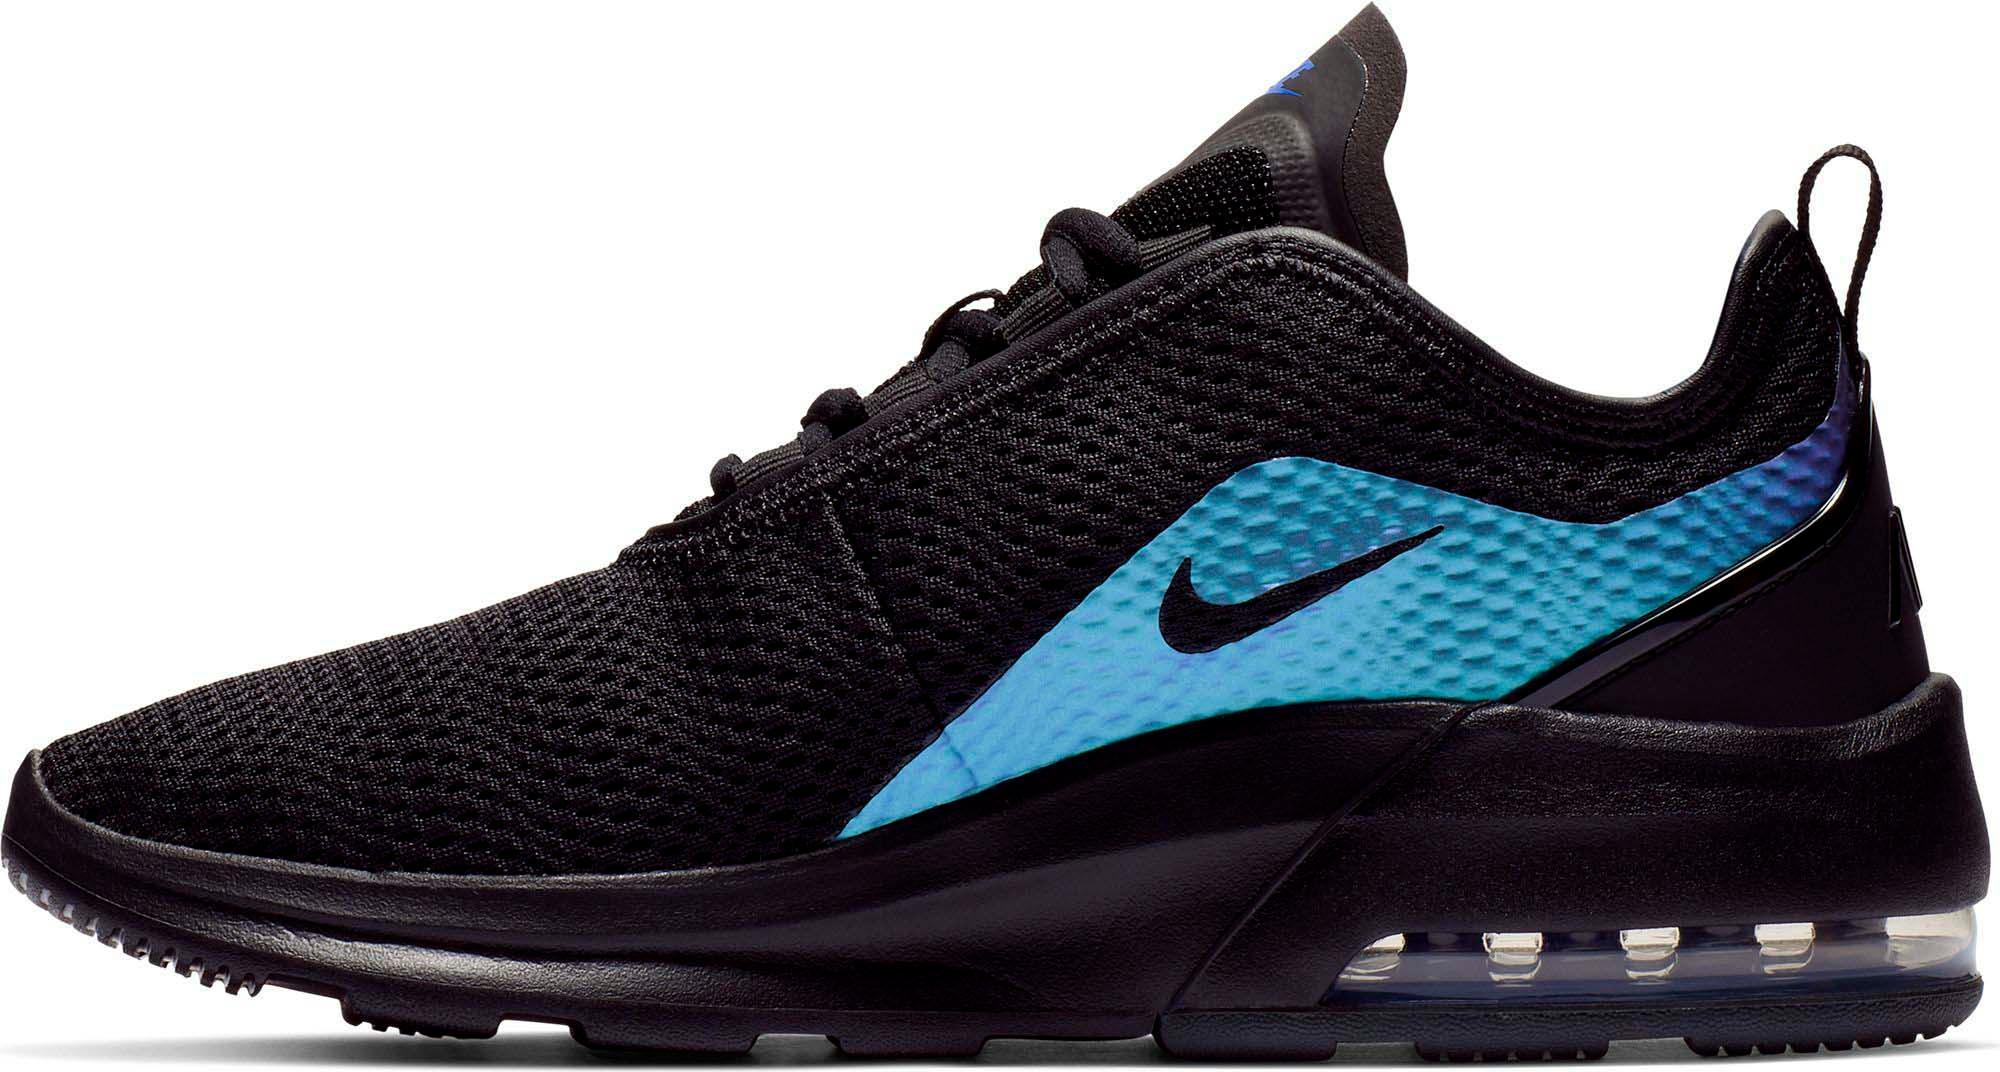 50% Rabatt. Am Besten Preise Nike Air Vapormax Herren